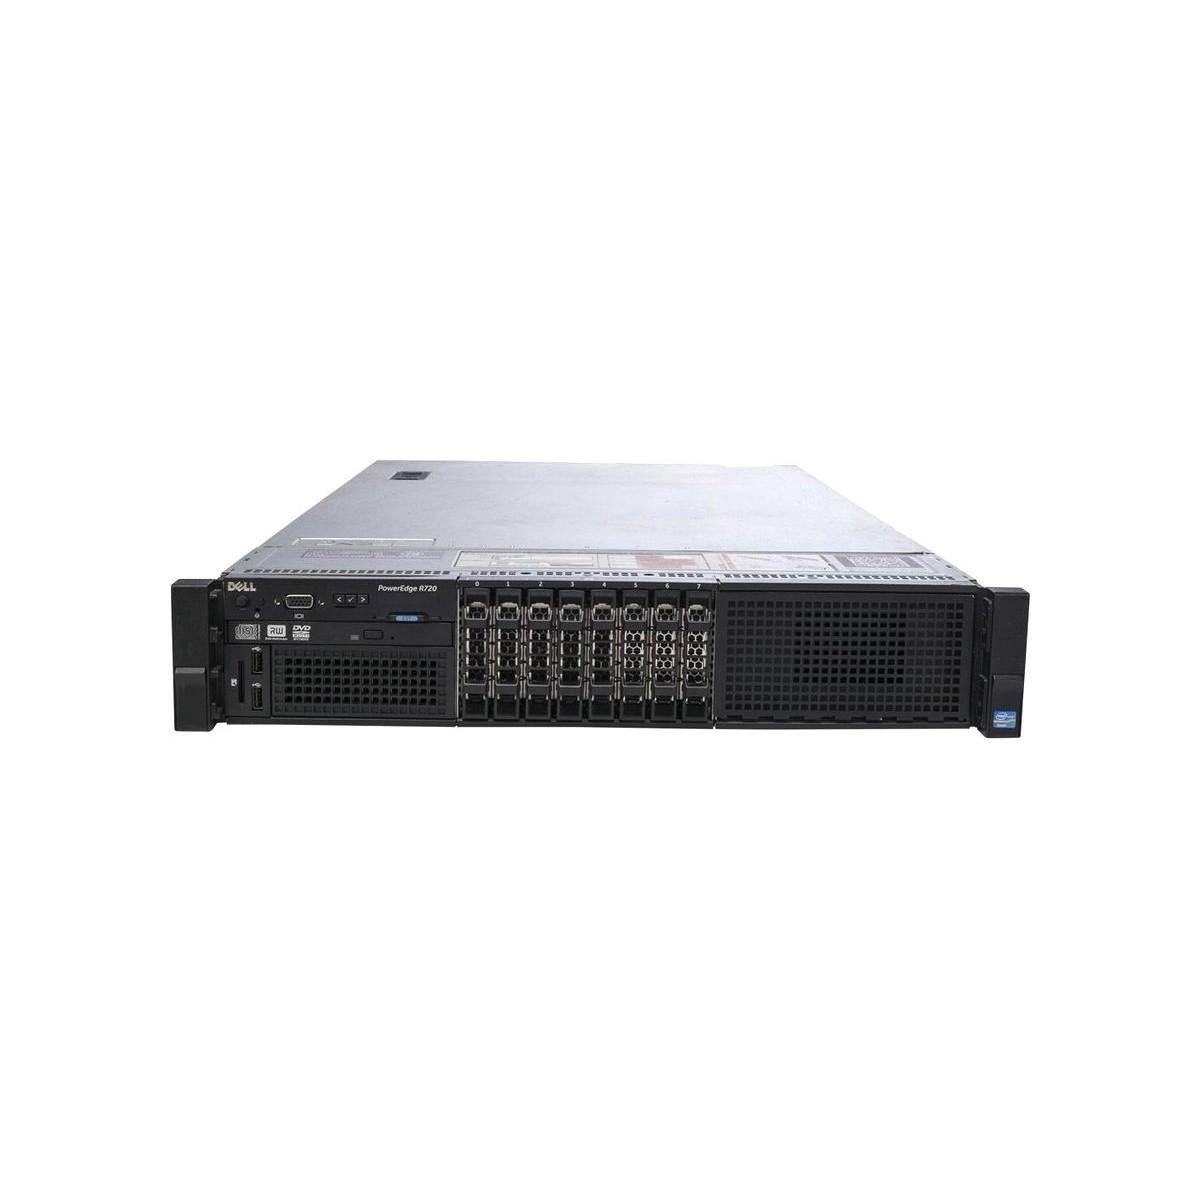 DELL R720 2xE5-2620 v2 SIX 16GB 0HDD H310 2xPSU